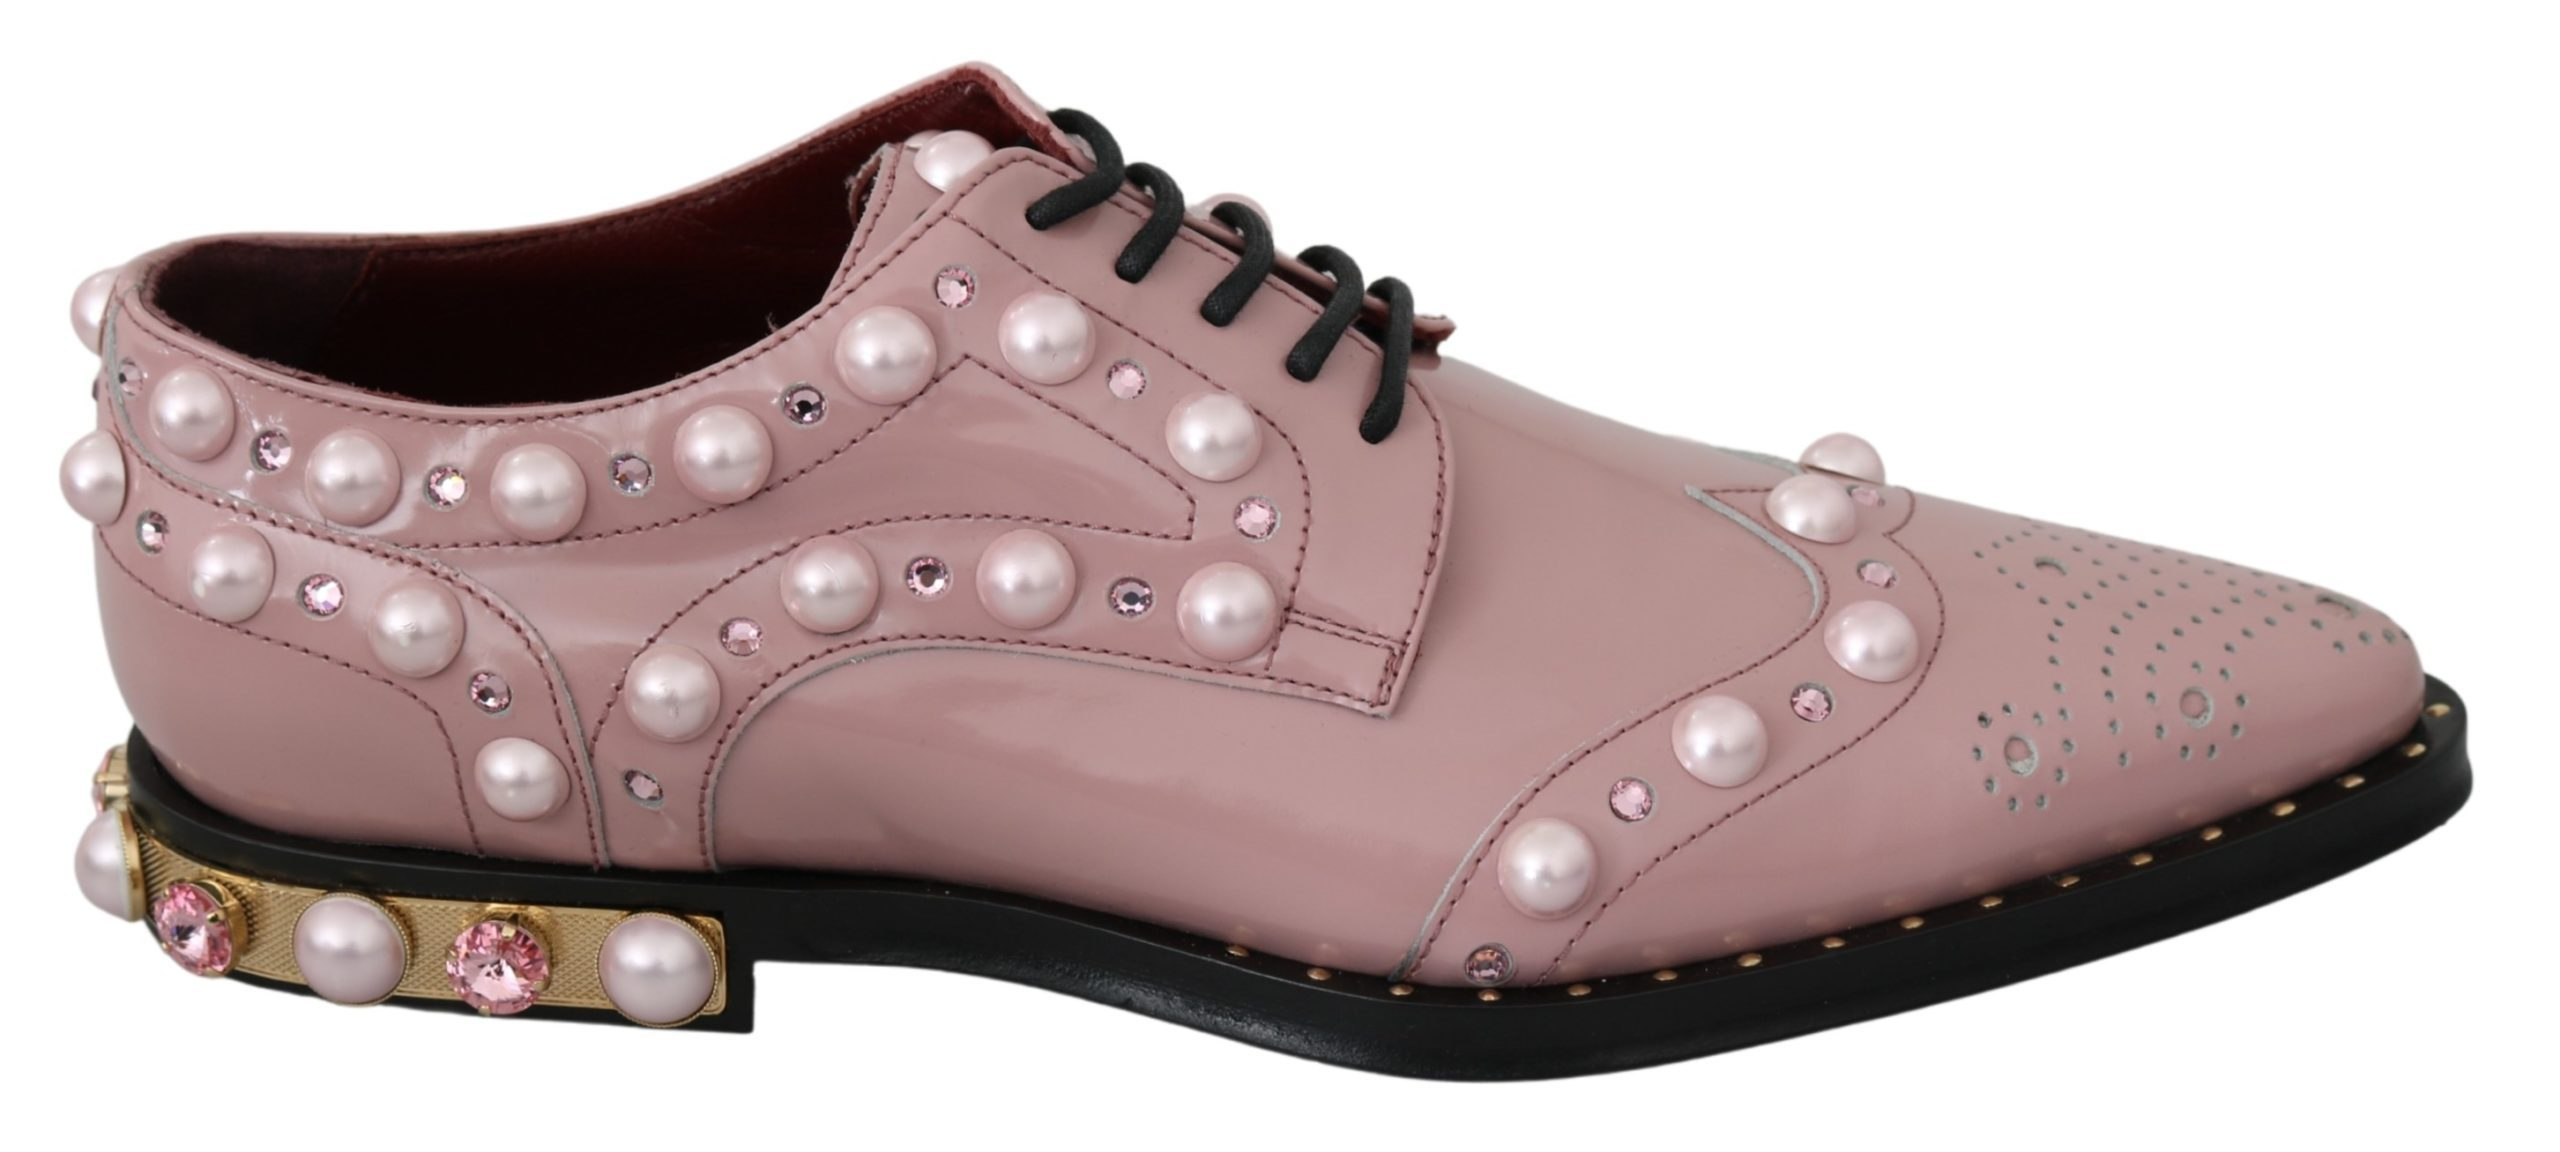 Dolce & Gabbana Women's Leather Crystal Pearls Studs Formal Shoe Pink LA6912 - 39